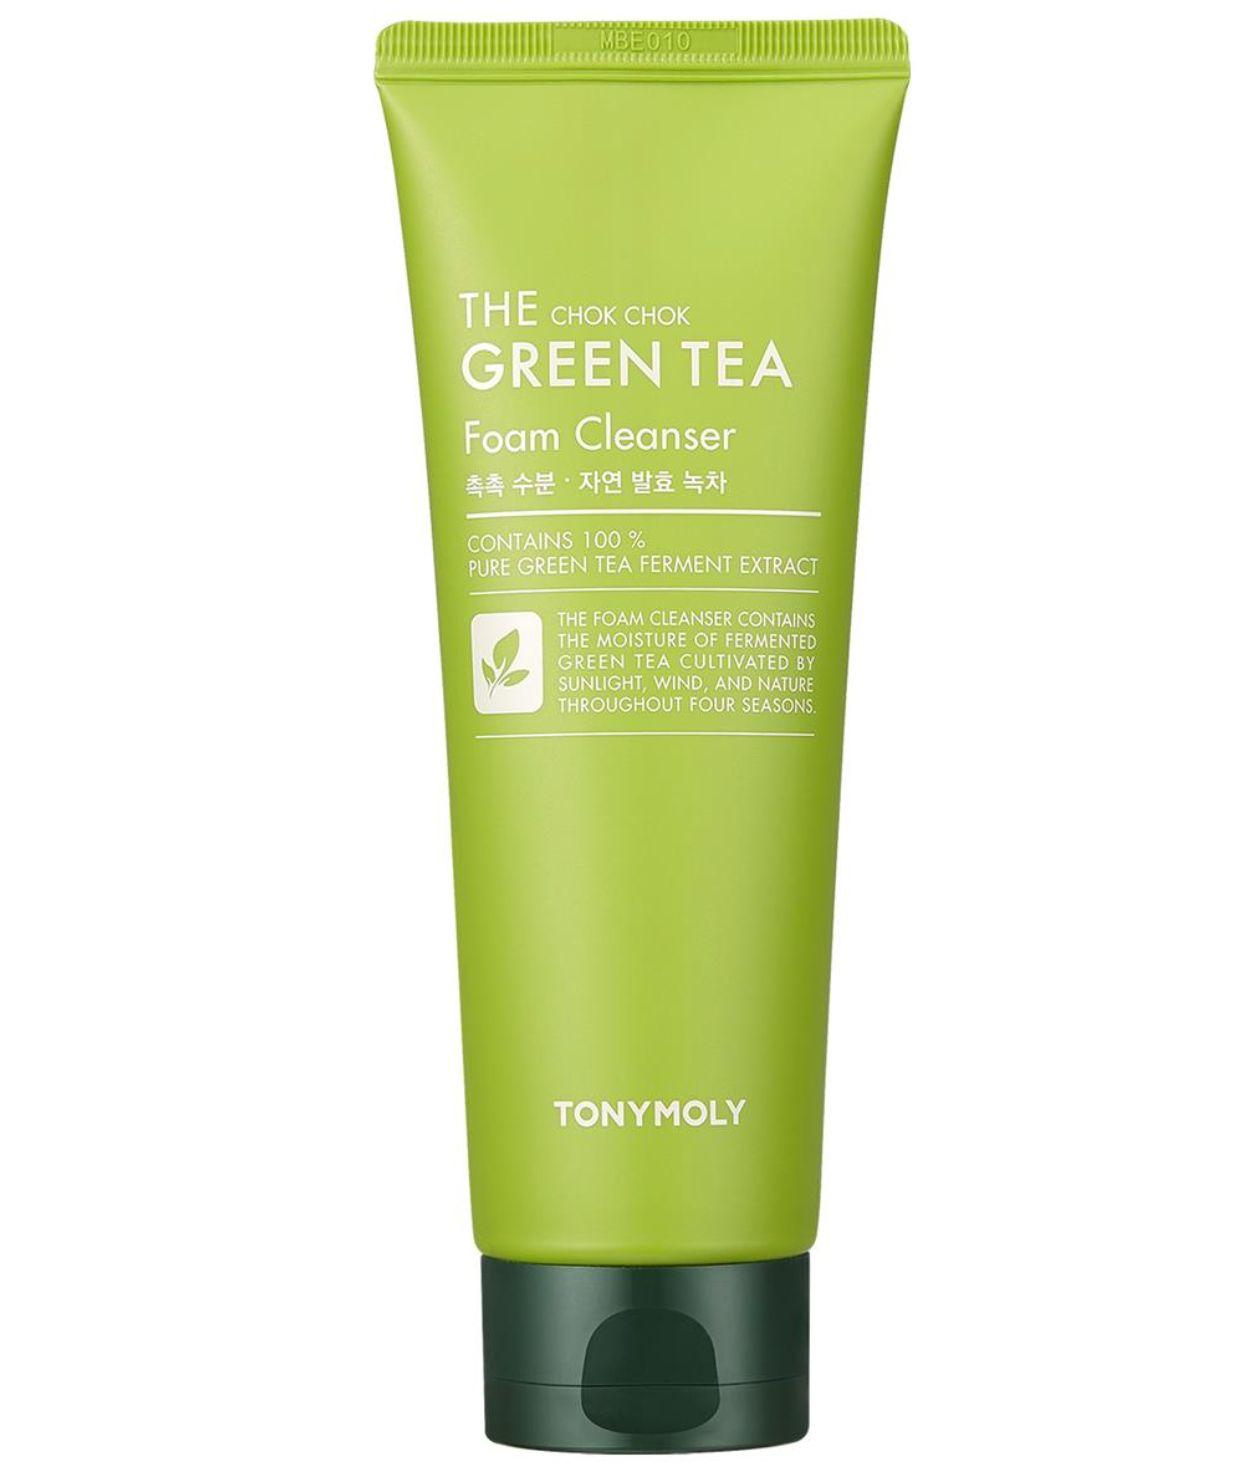 k-beauty TONYMOLY The Chok Chok Green Tea Foam Cleanser 200ml